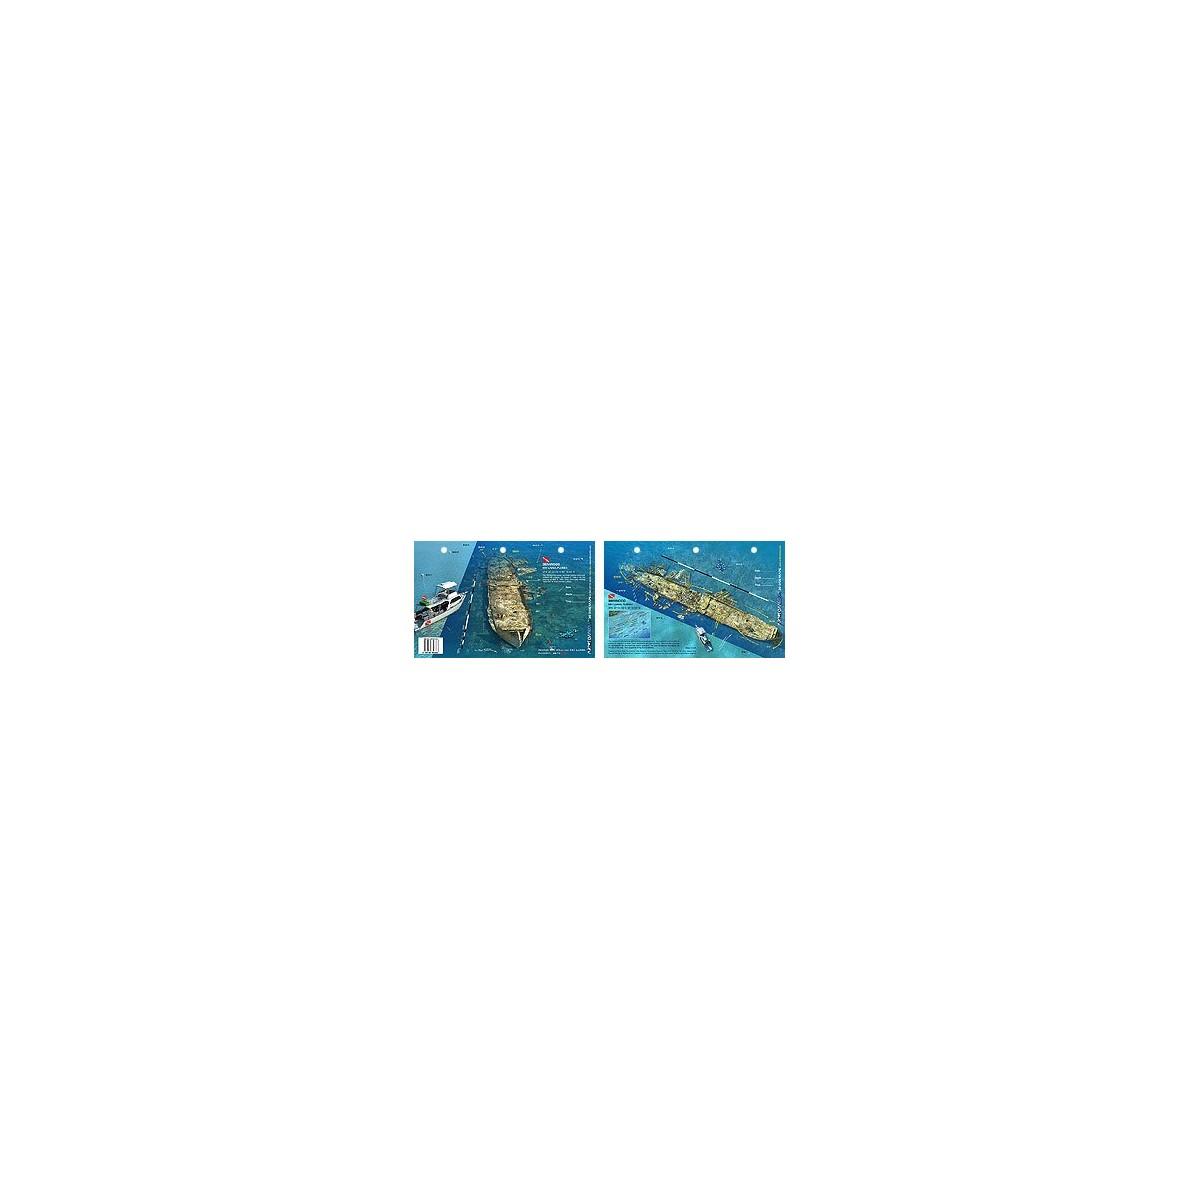 Benwood in Key Largo, Florida (8.5 x 5.5 Inches) (21.6 x 15cm) - New Art to Media Underwater Waterproof 3D Dive Site Map